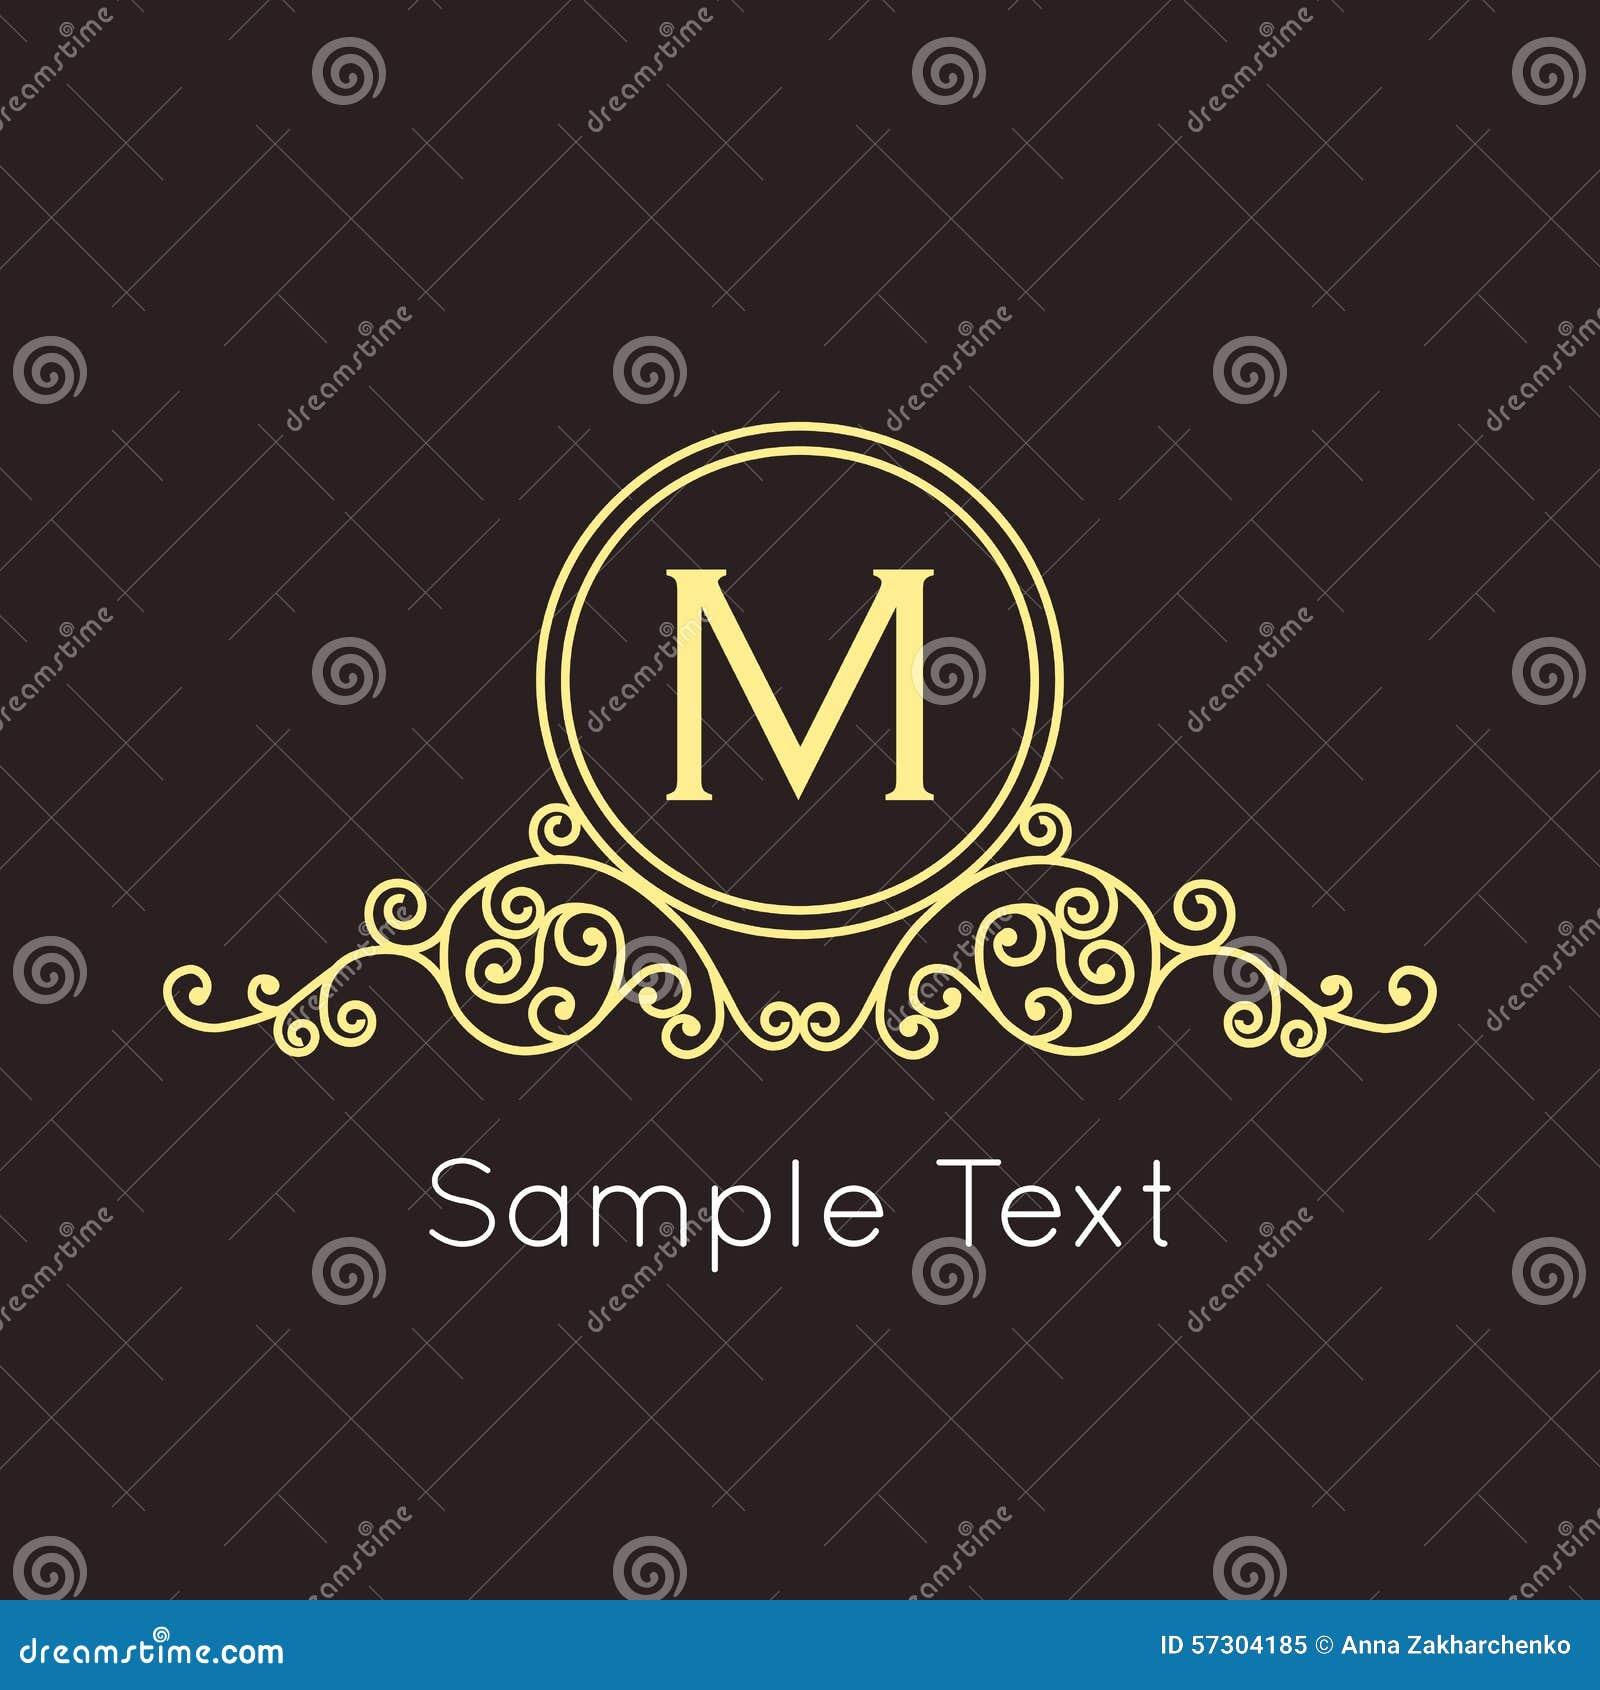 Art Deco Geometric Outline Monogram And Logo Design Element Vector